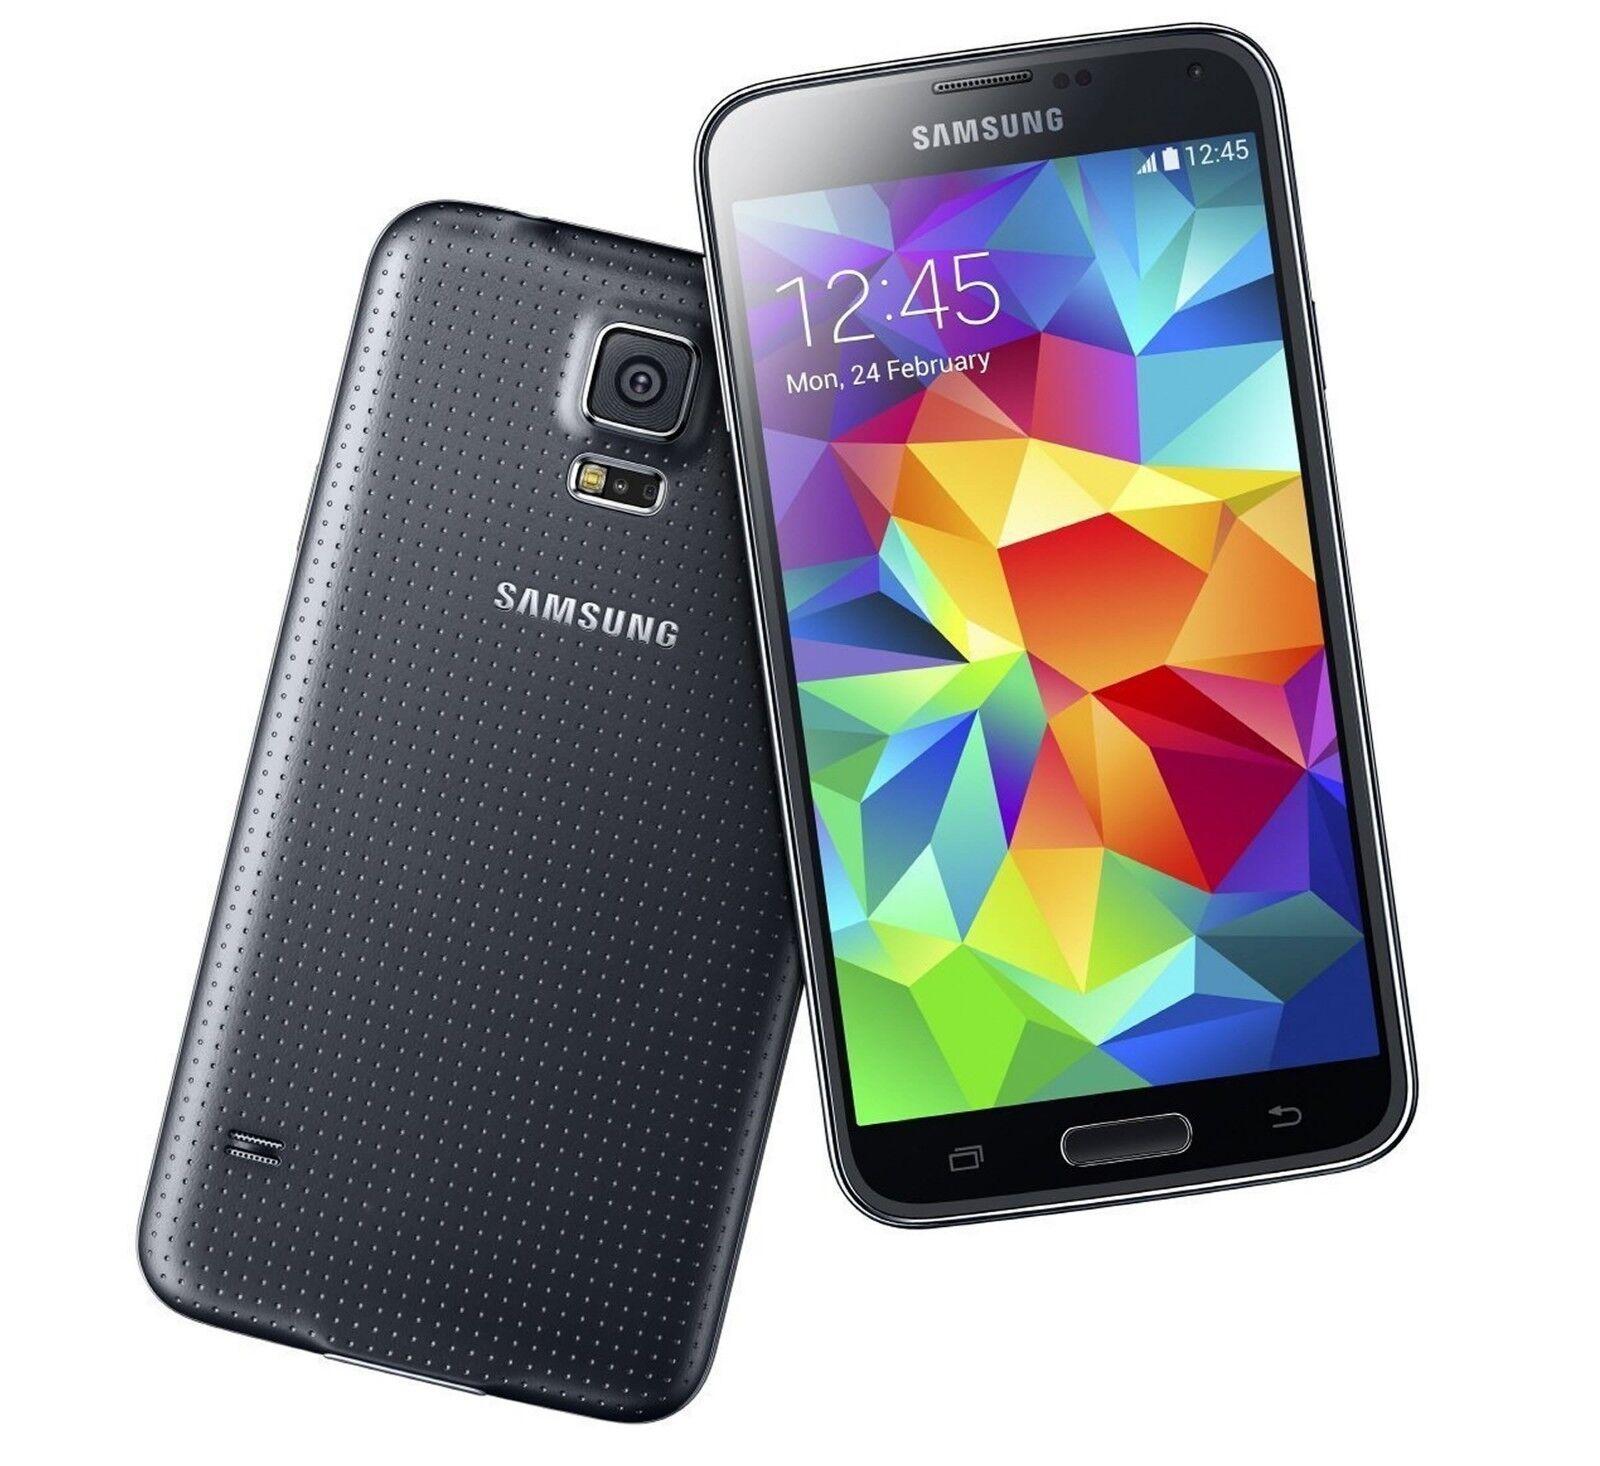 Samsung Galaxy S5 16GB G900V Verizon Unlocked Android Smartphone